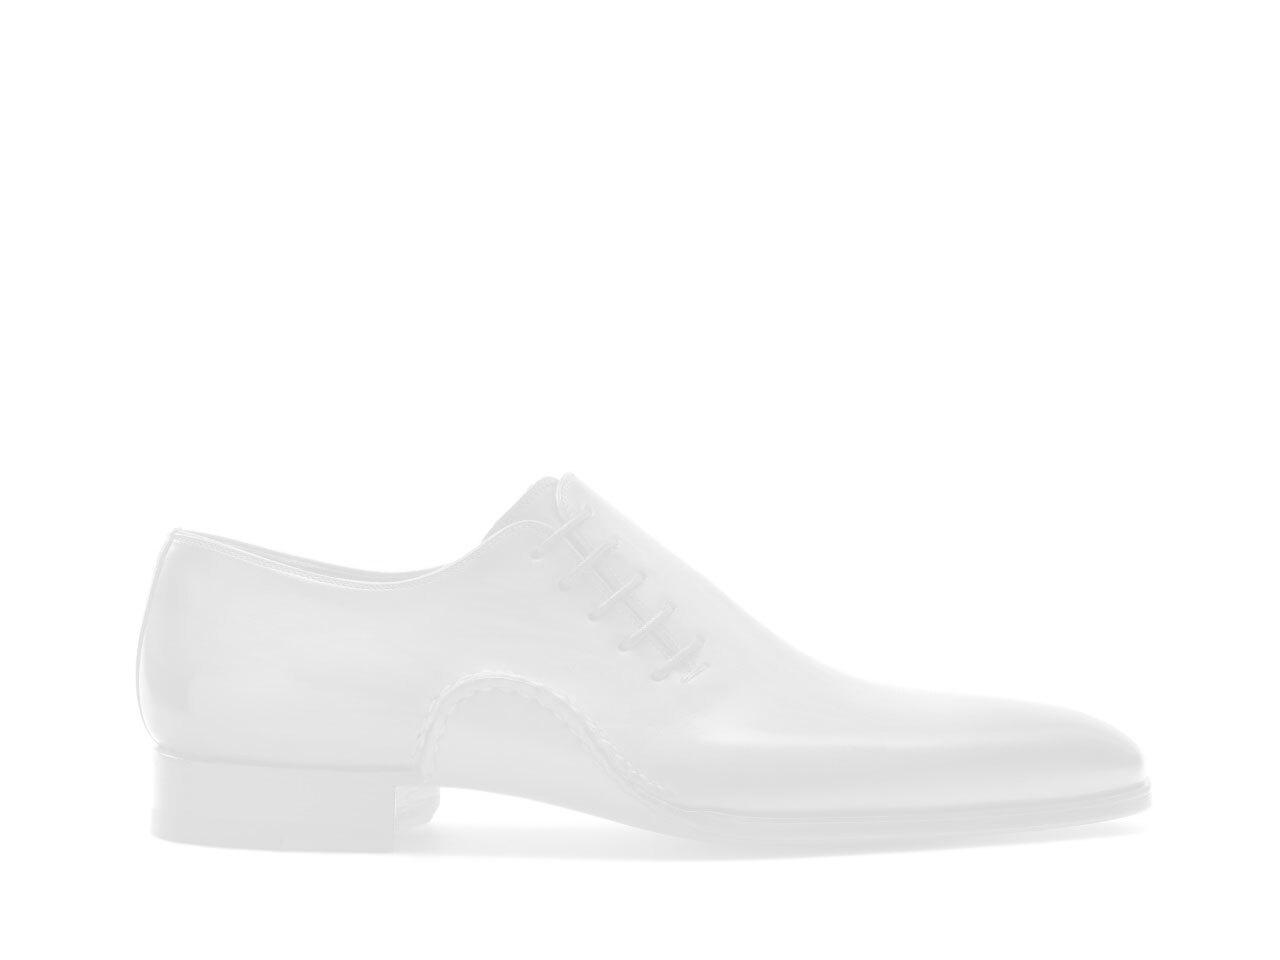 Pair of the Magnanni Islaro Cuero Men's Double Monk Strap Shoes